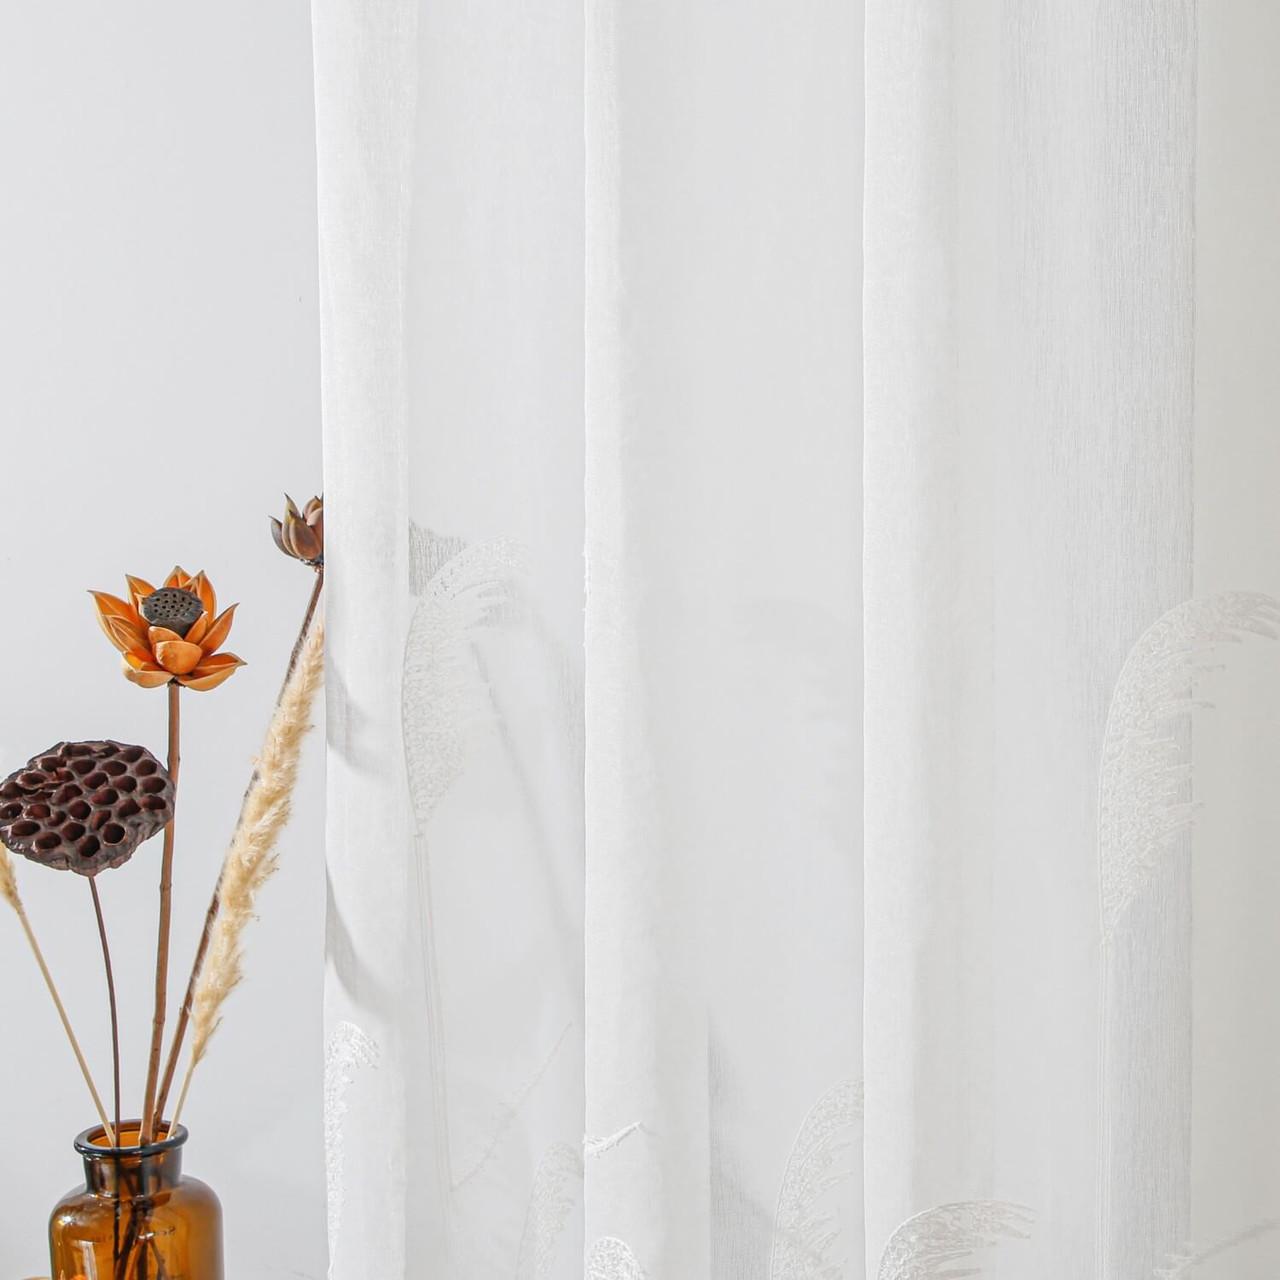 Sheer Curtain Panel Grommet-Top Window Treatments DMC725 Dolce Mela 8171460151778